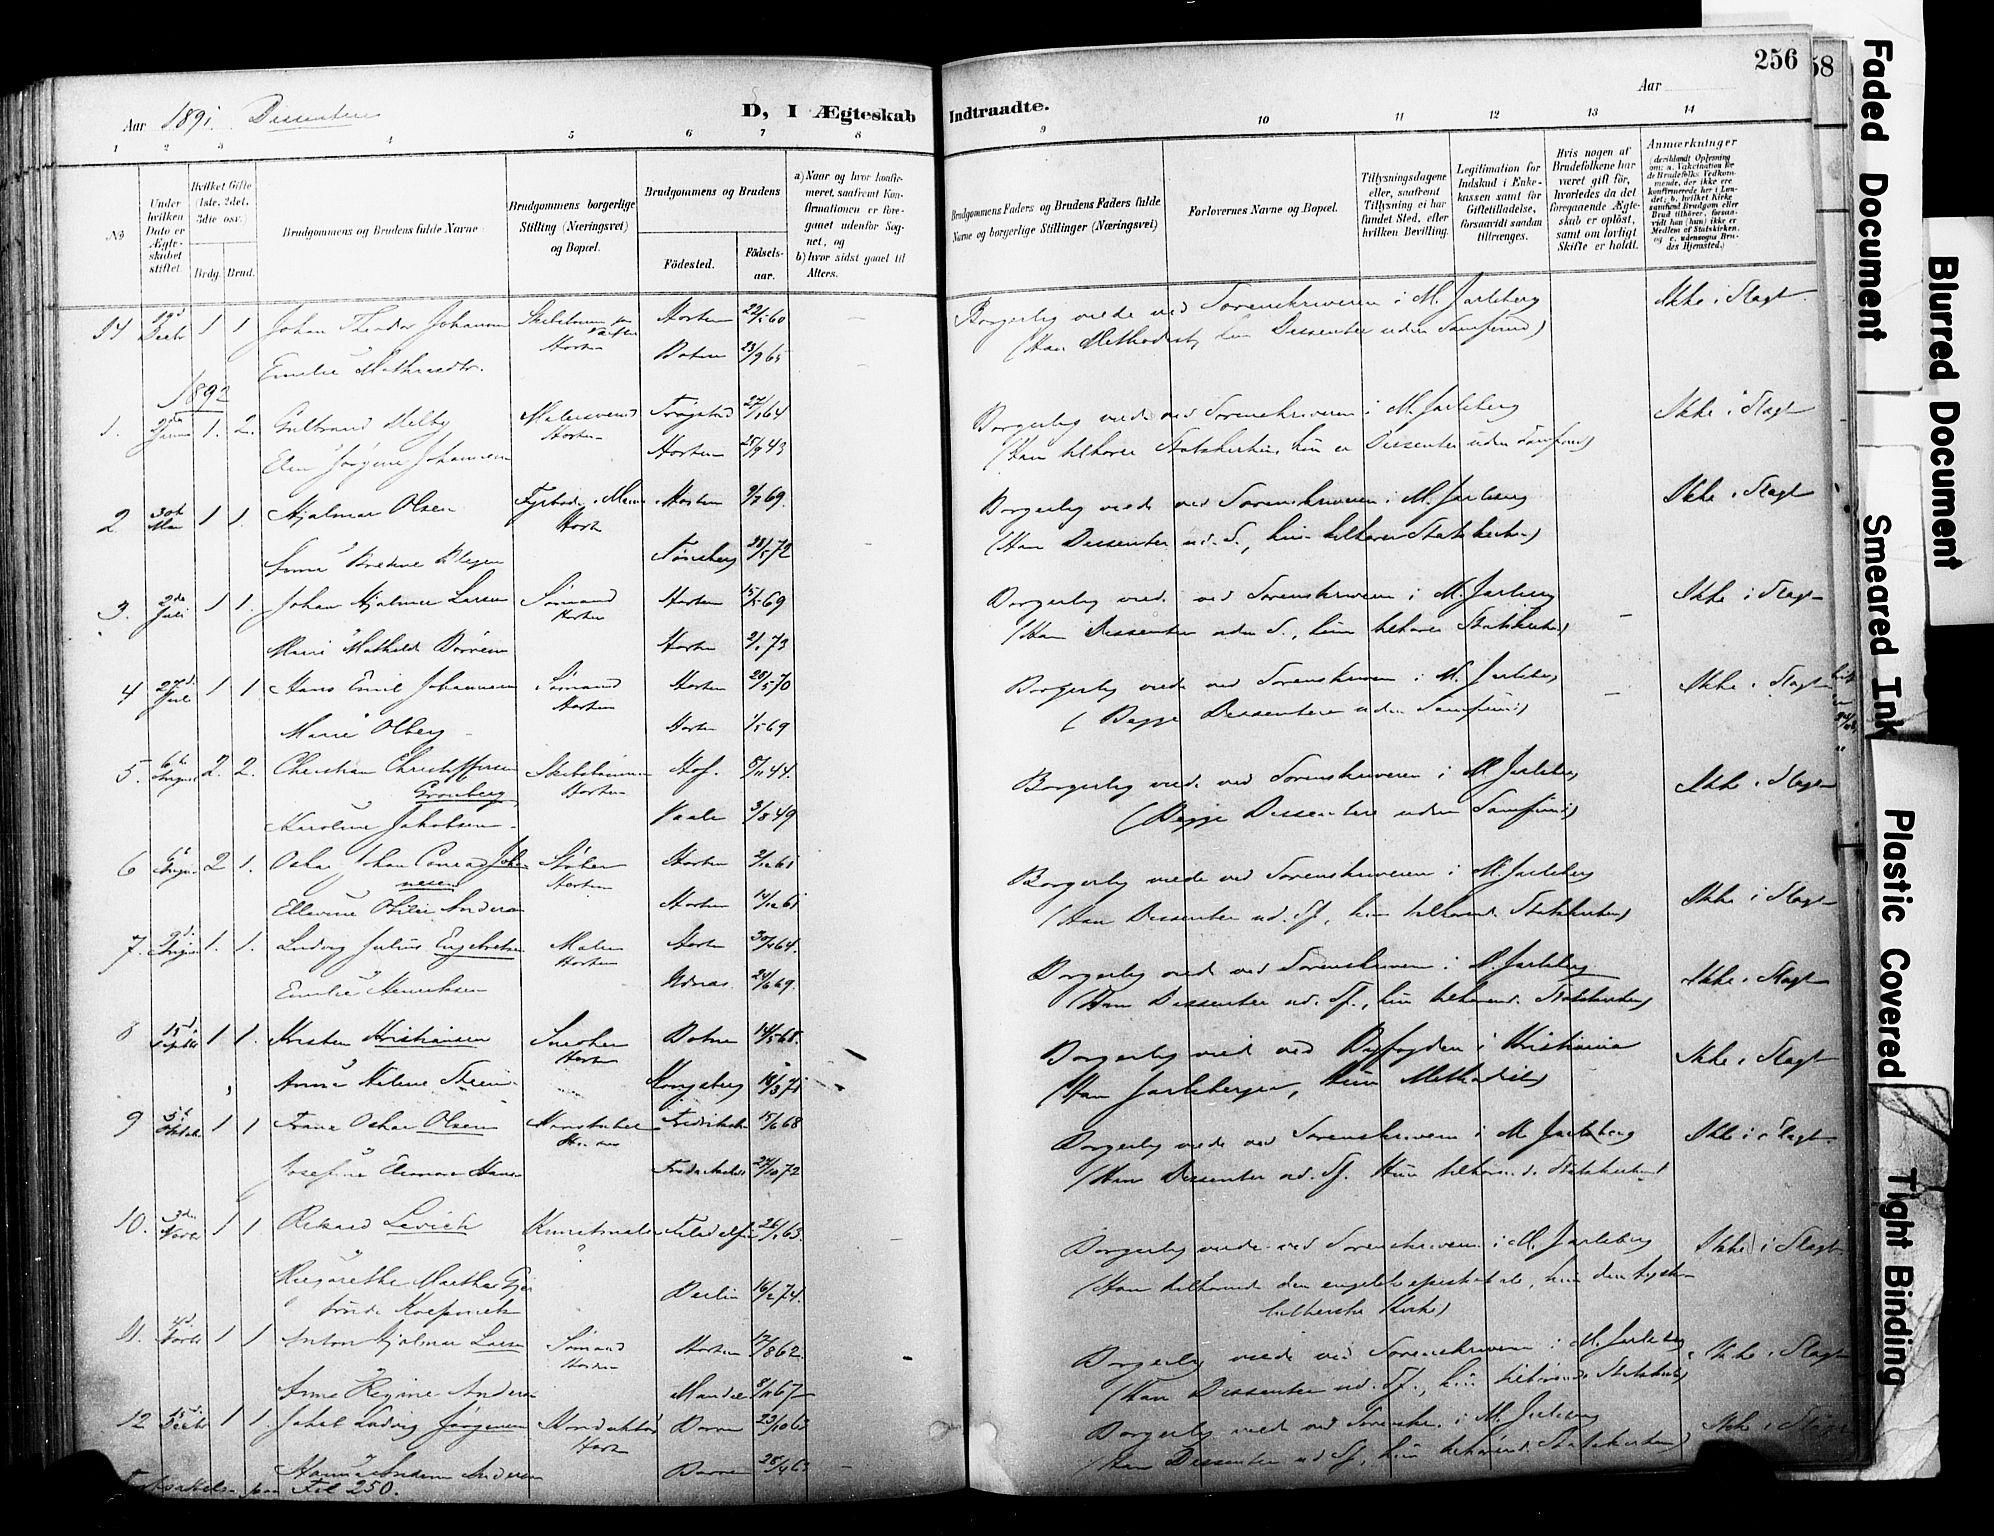 SAKO, Horten kirkebøker, F/Fa/L0004: Parish register (official) no. 4, 1888-1895, p. 256